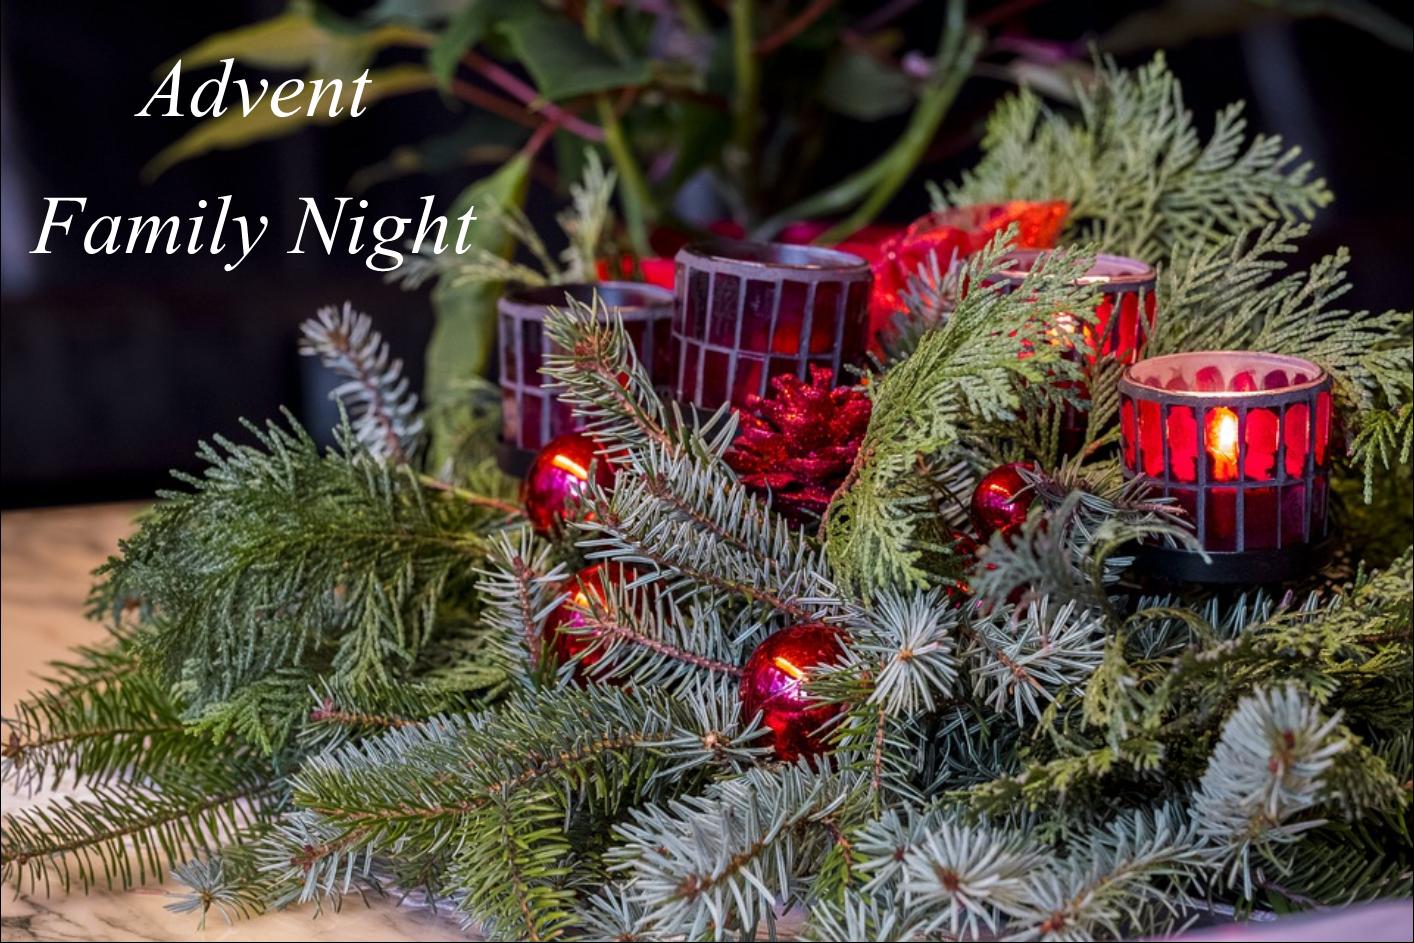 , Advent Family Night, St. Joseph-on-Carrollton Manor Catholic Church